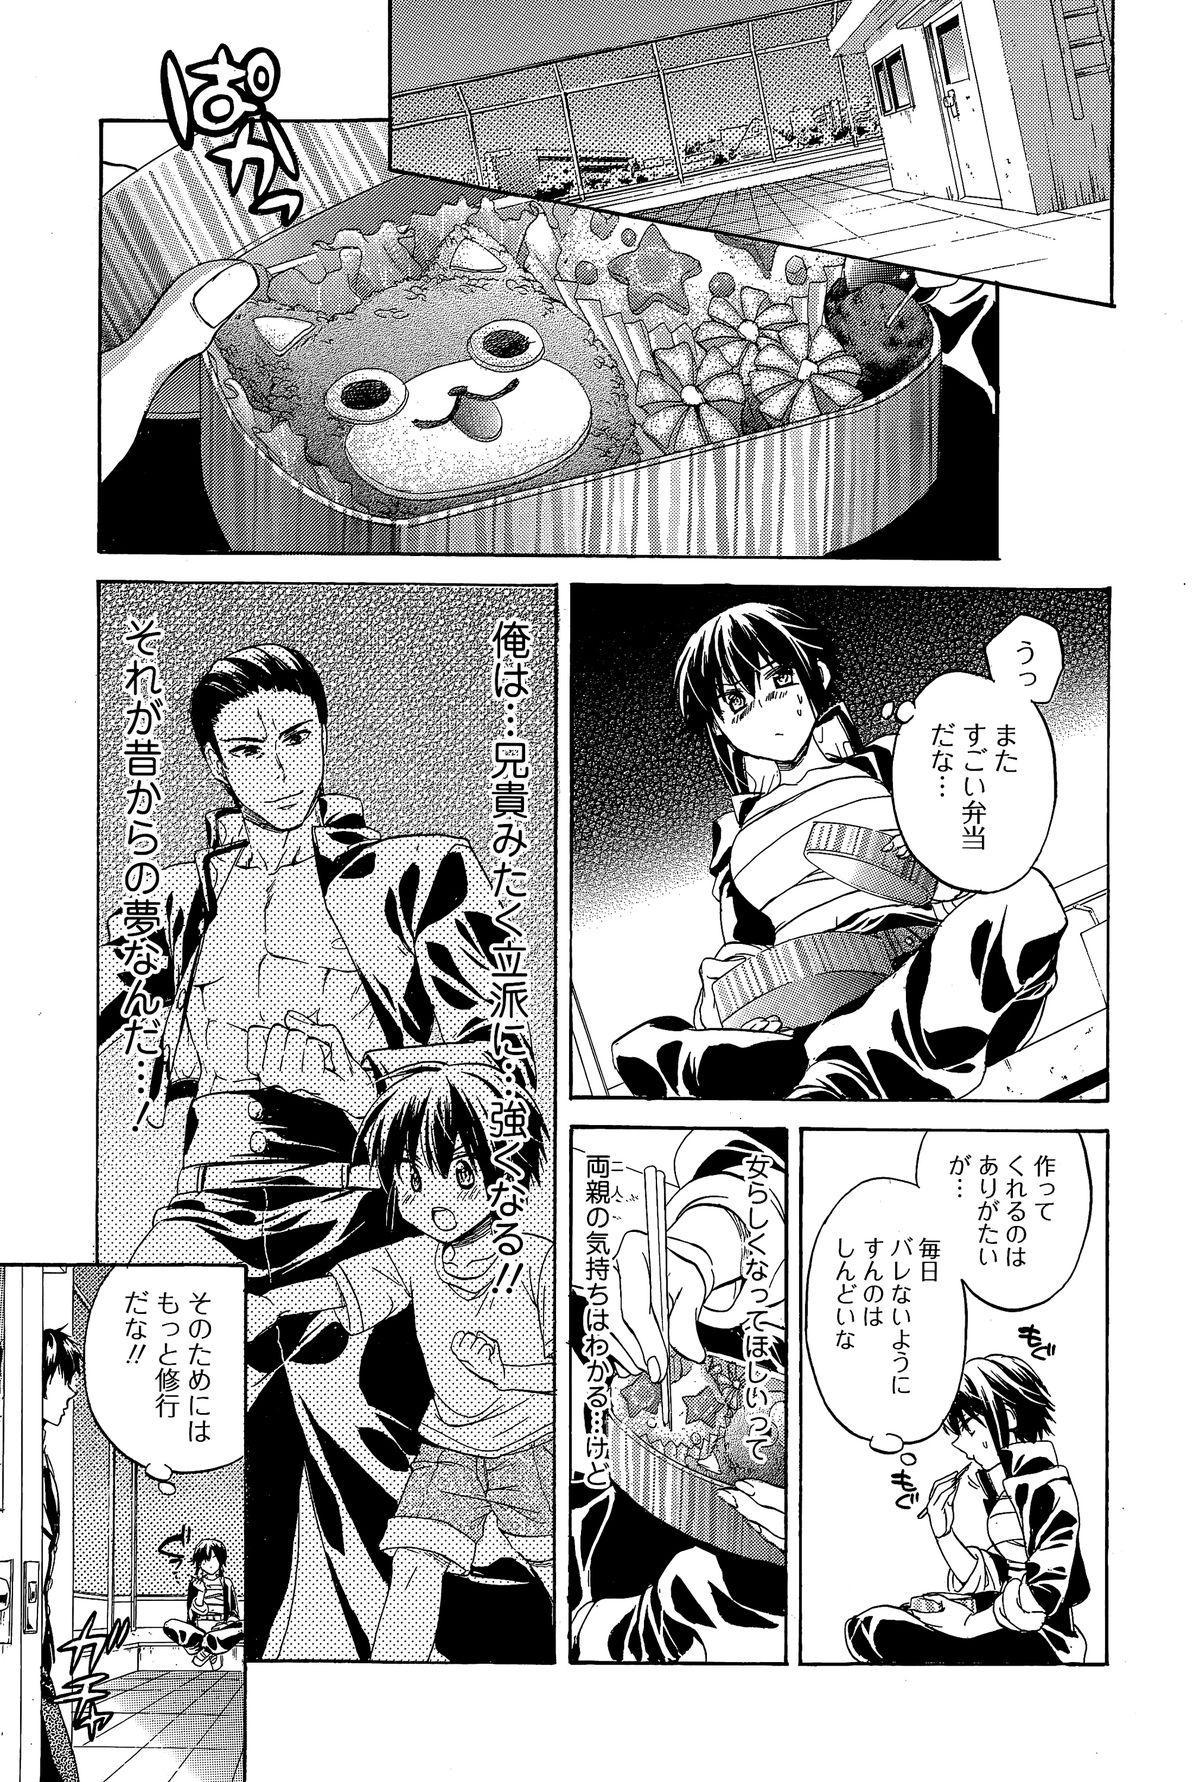 Comic Toutetsu 2015-02 Vol. 3 102